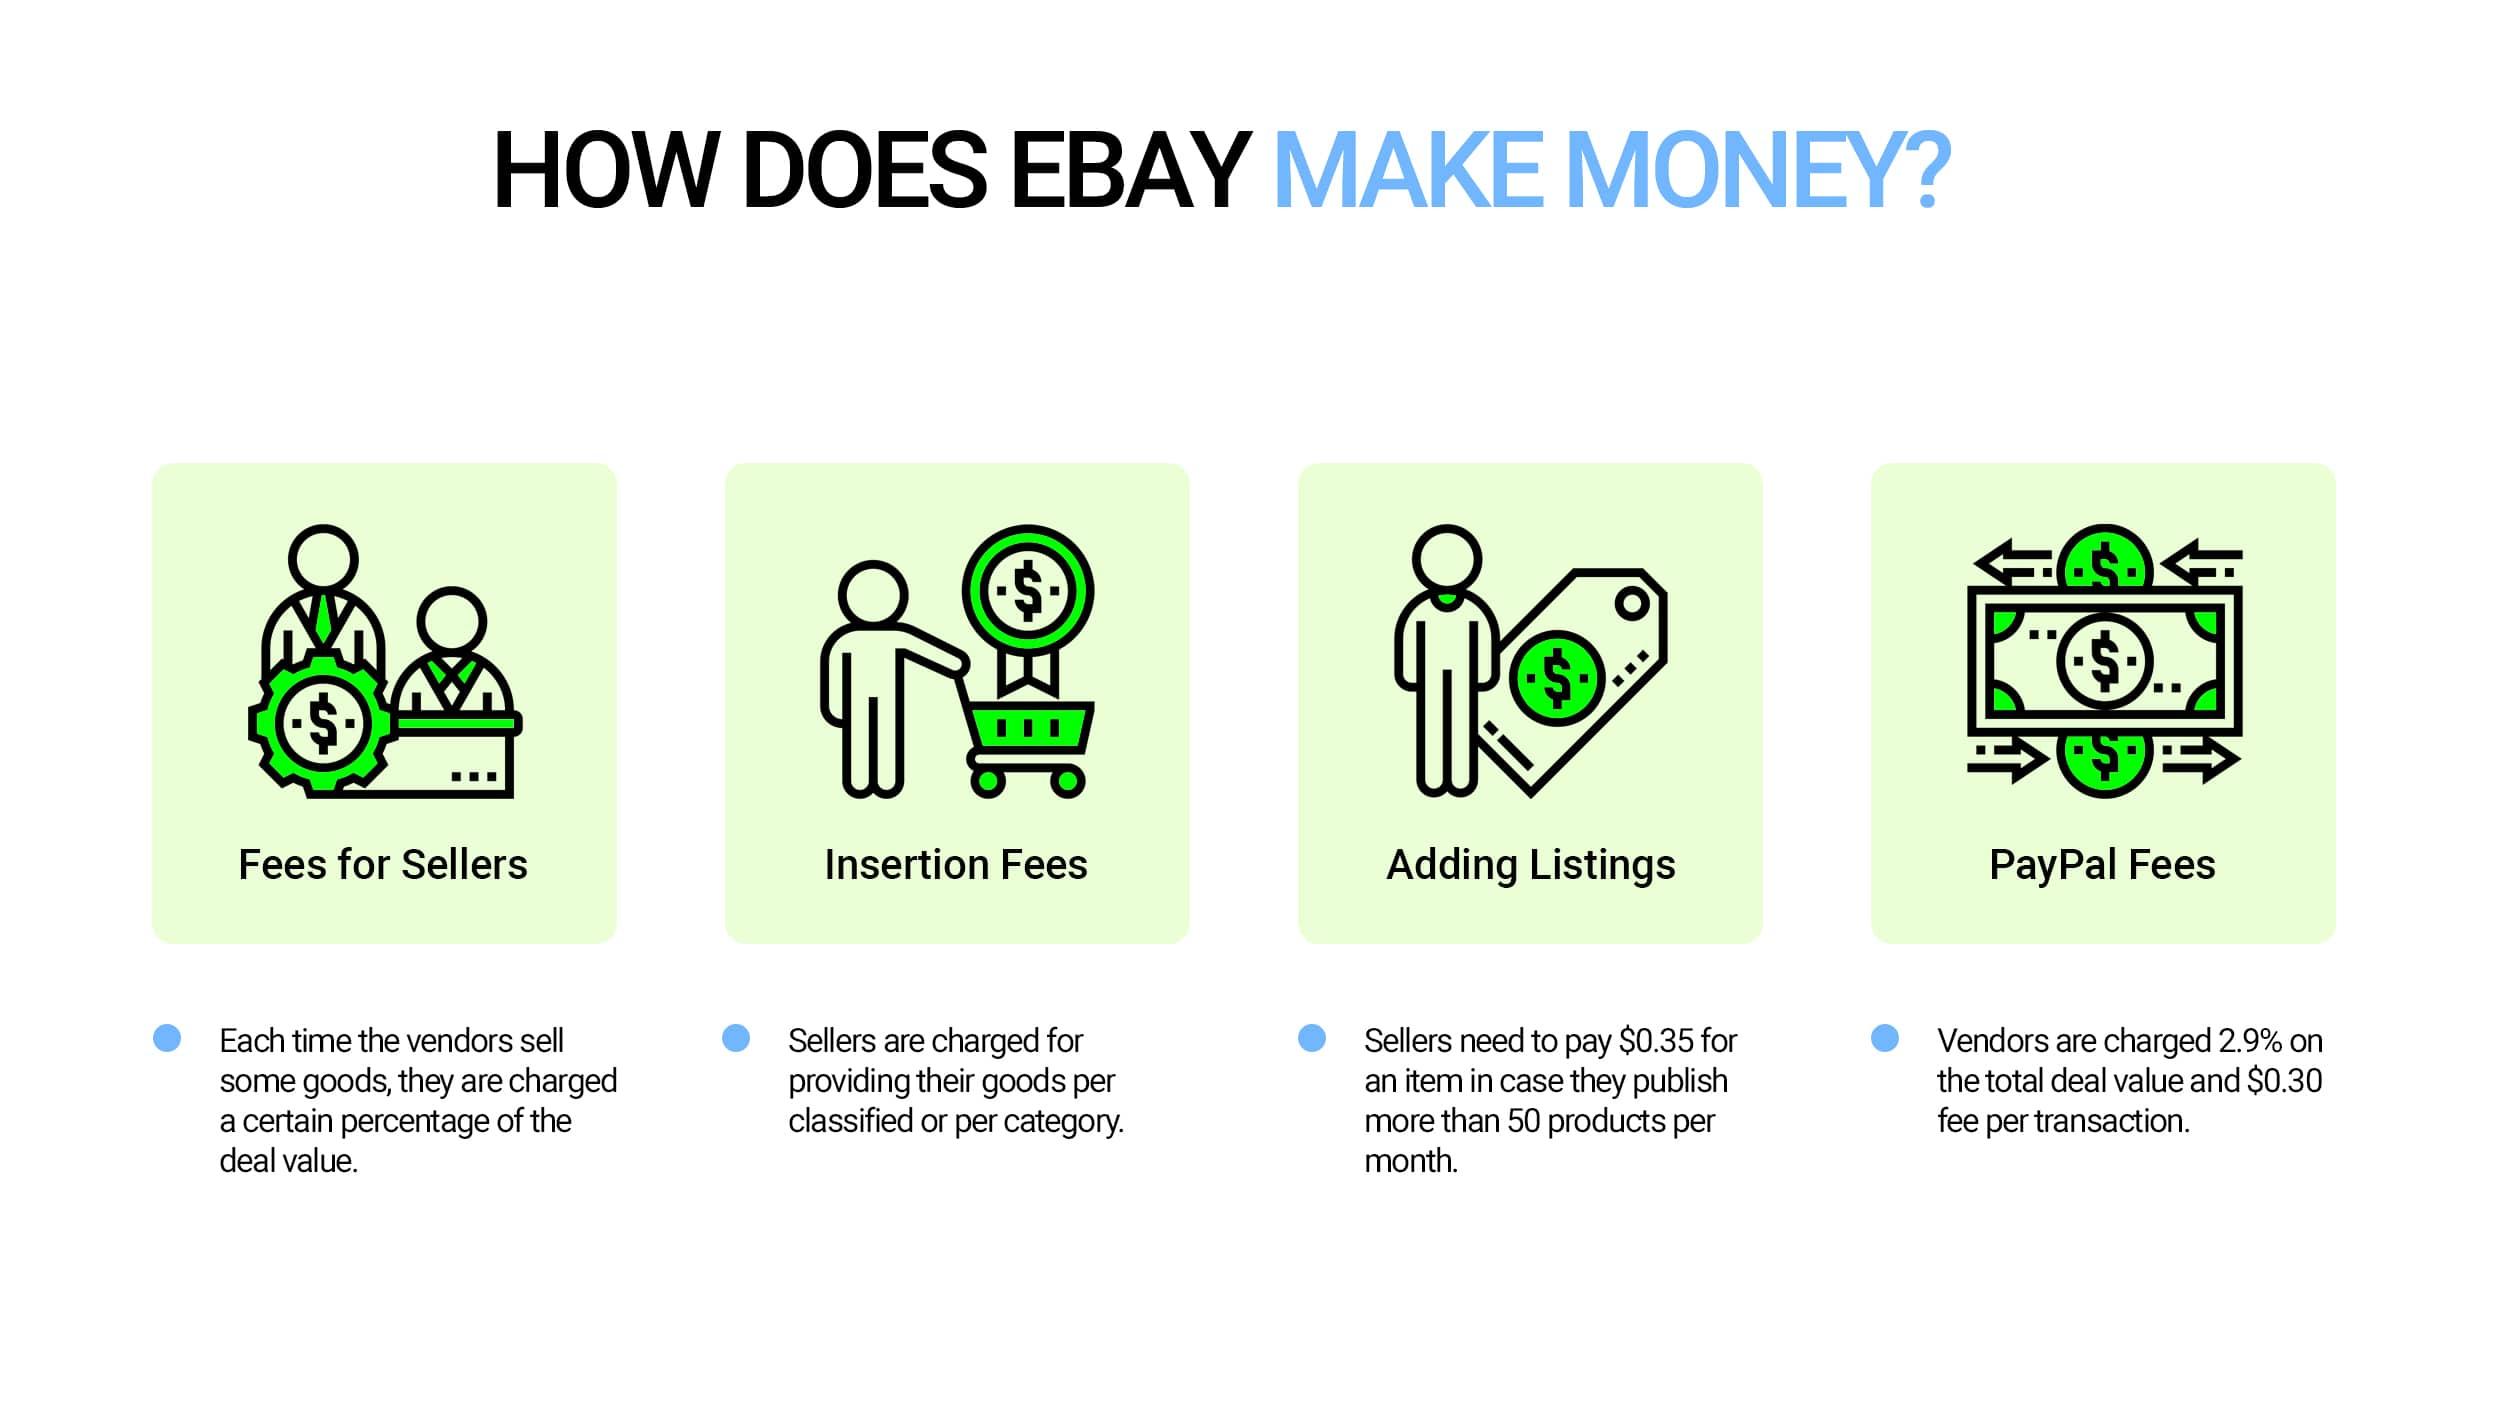 eBay's monetization strategy